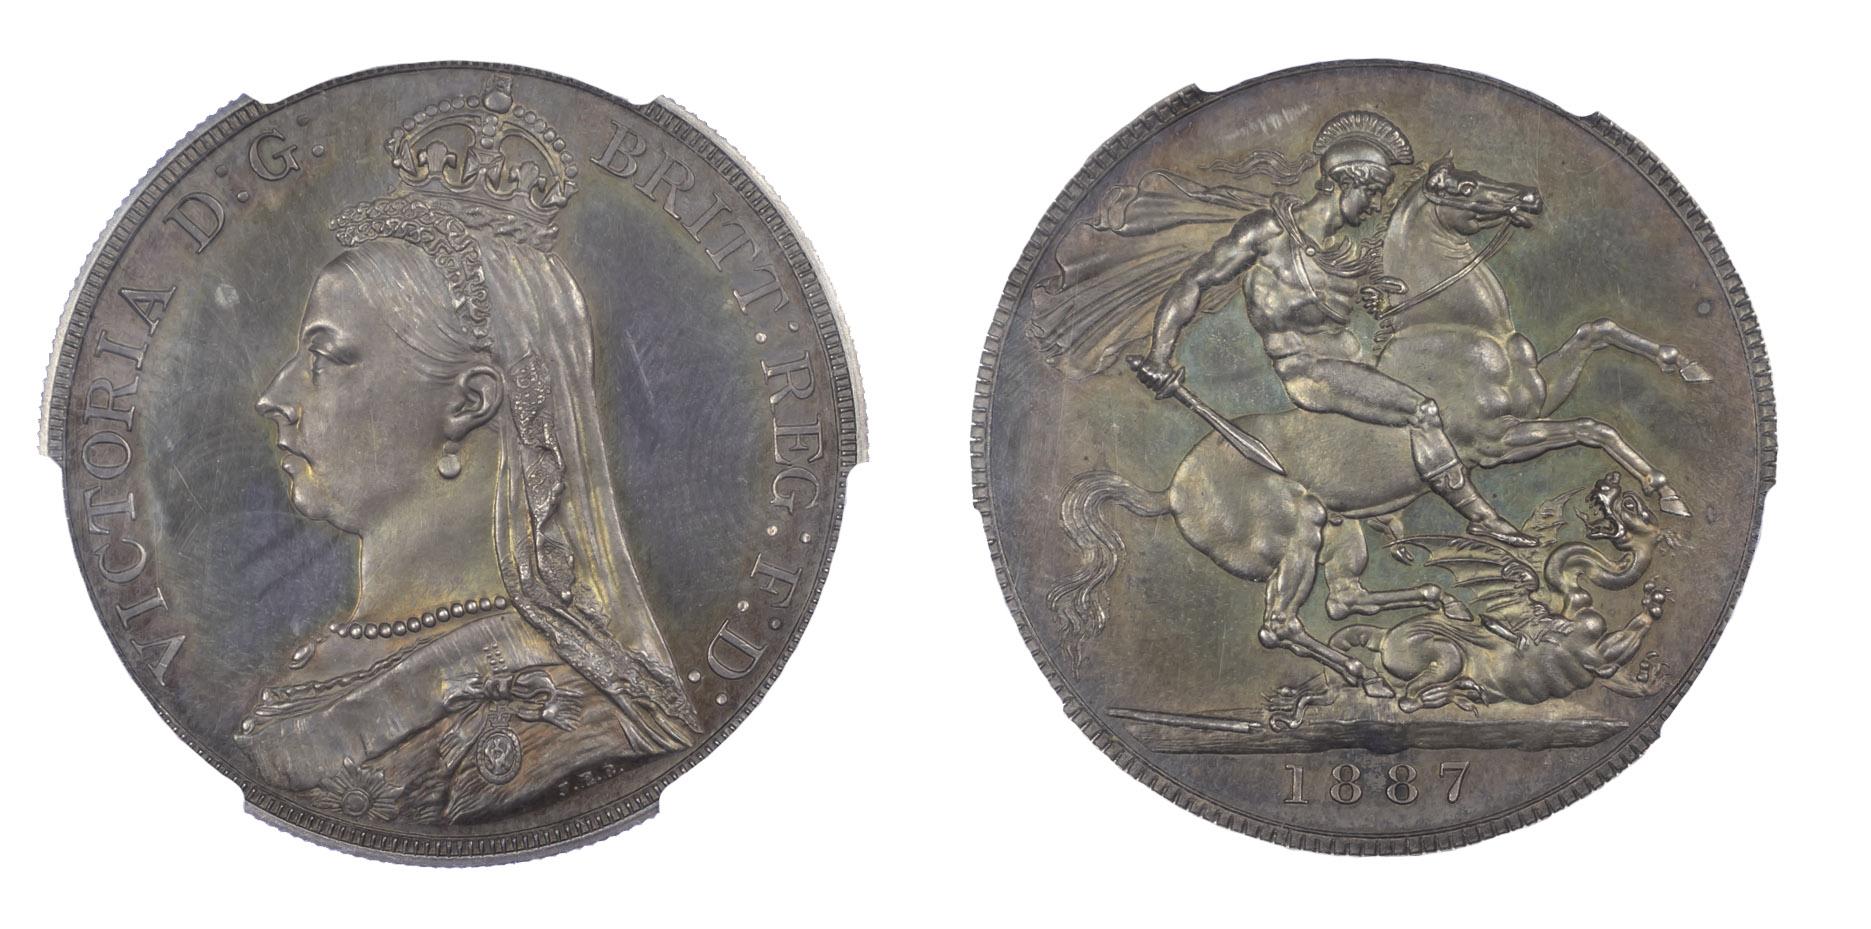 1887 Proof Victoria Crown Proof 64+